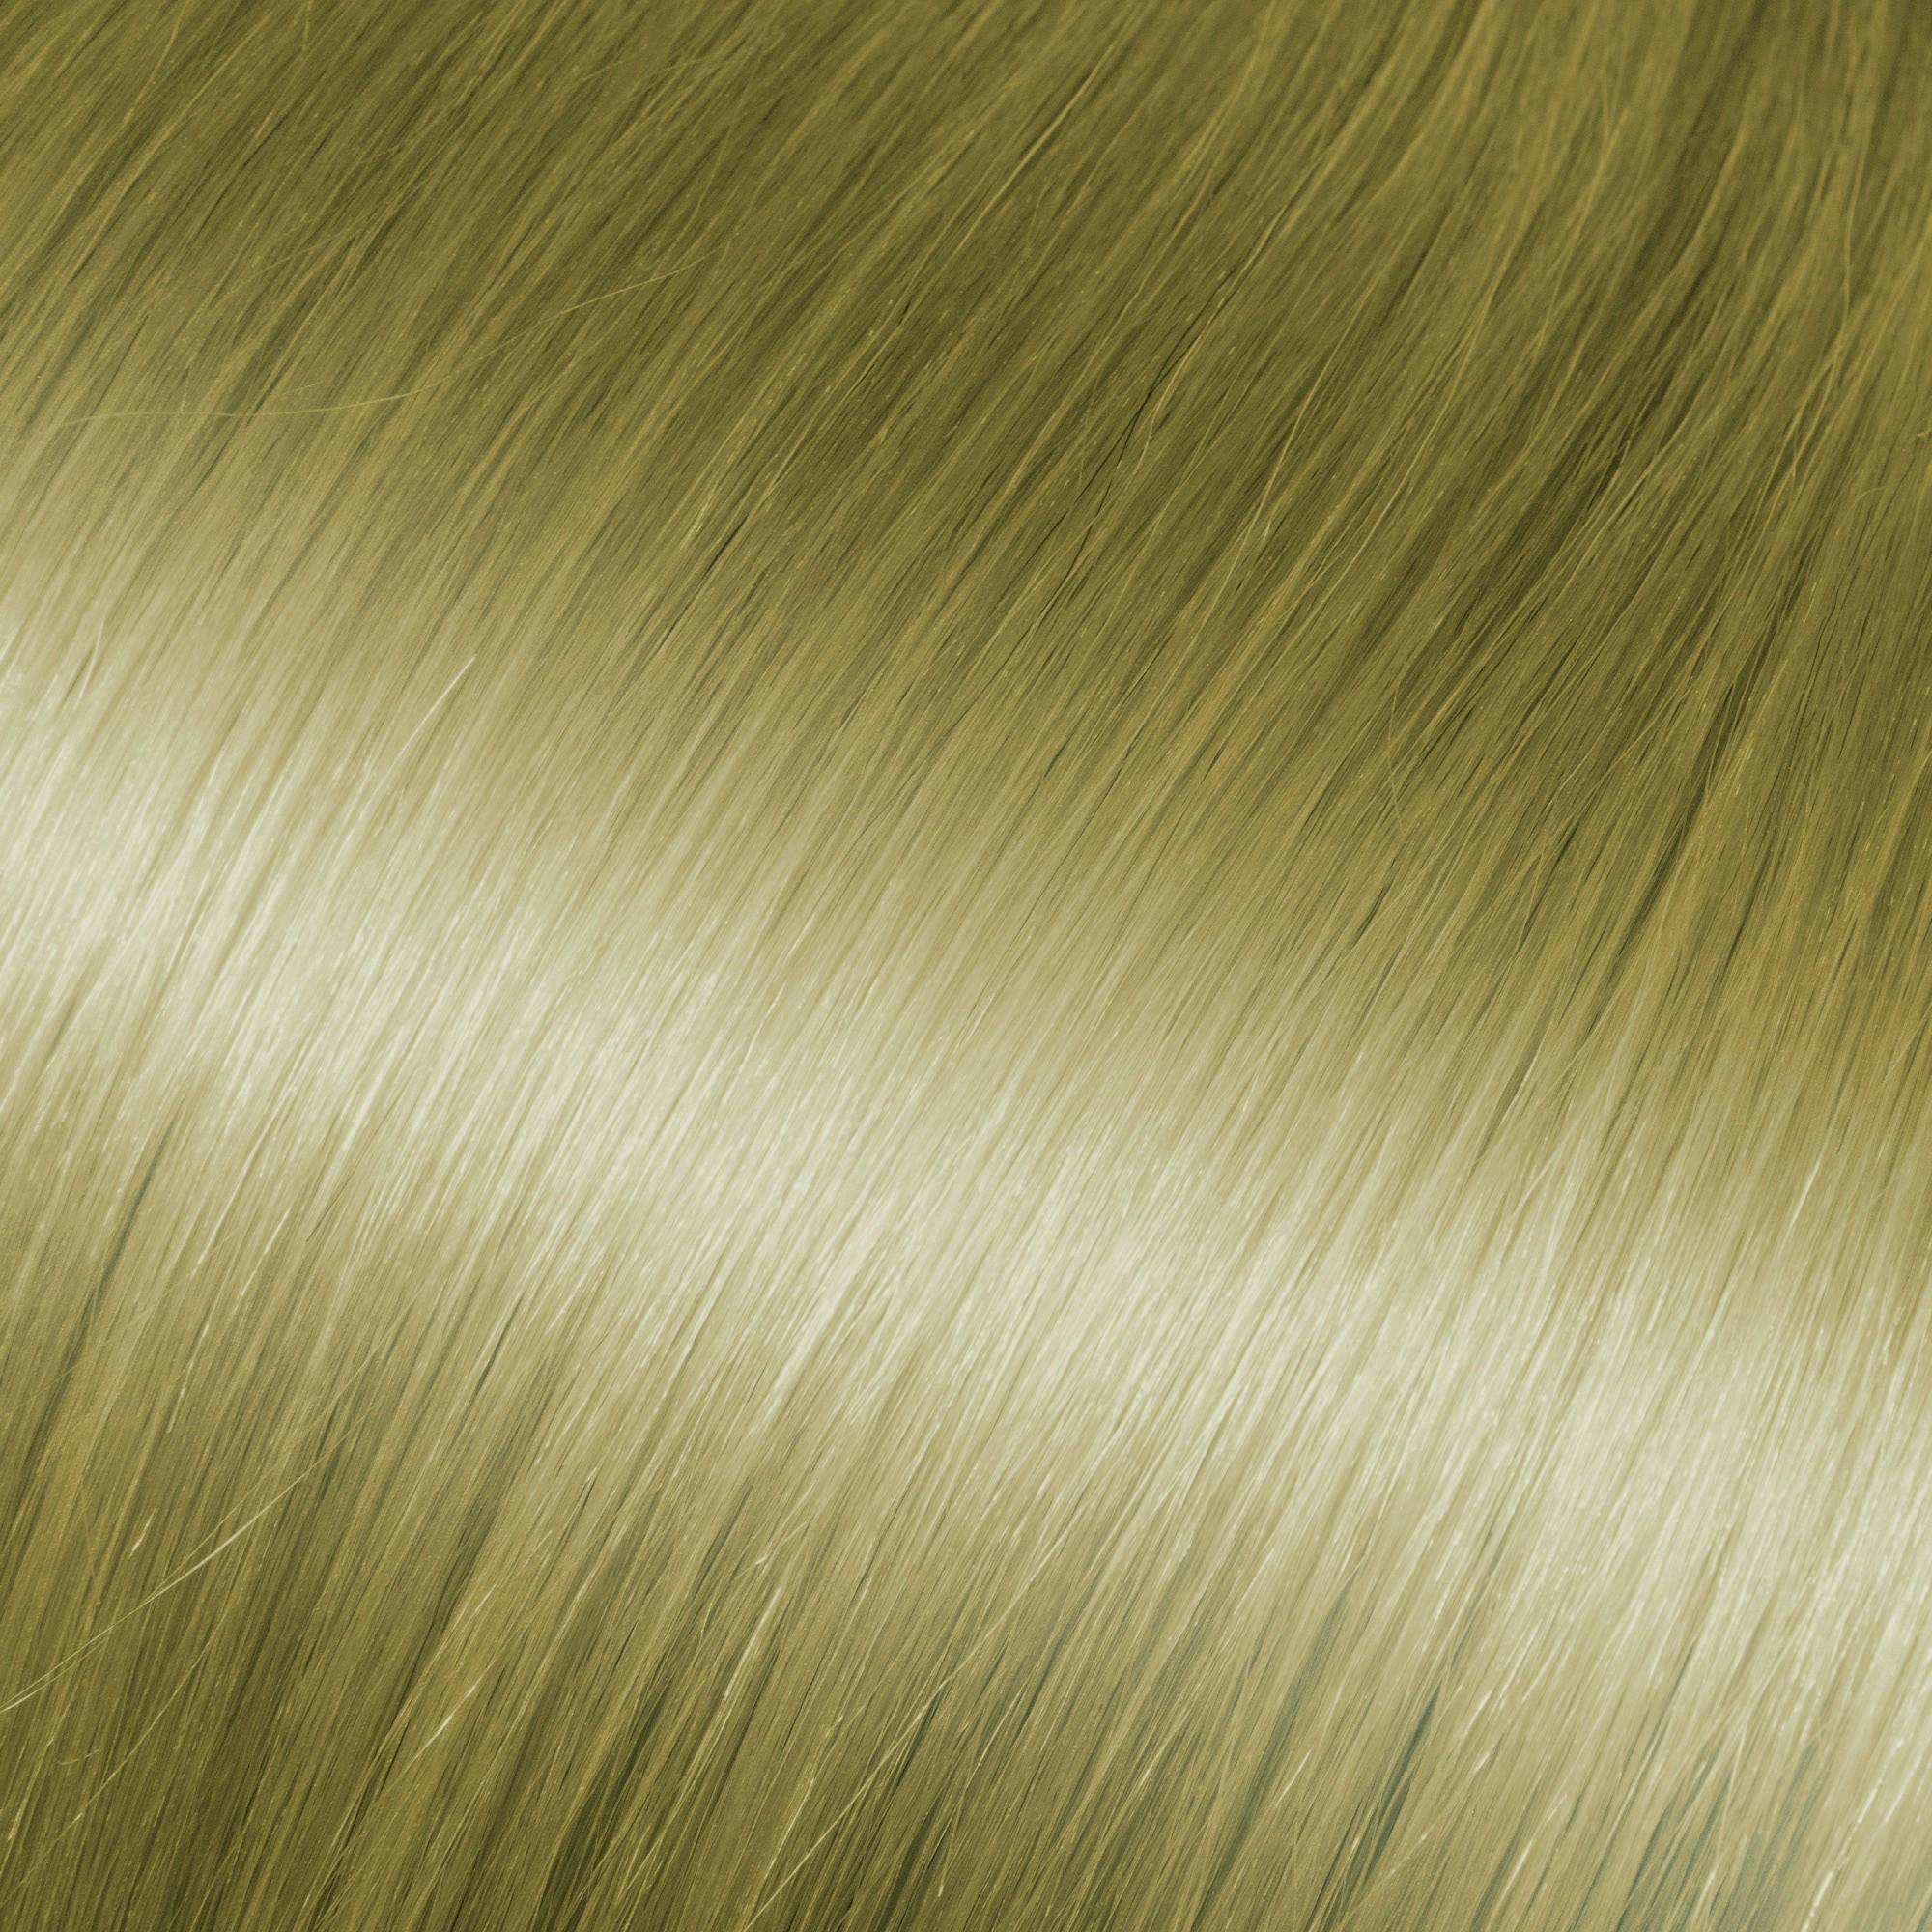 Średni Blond